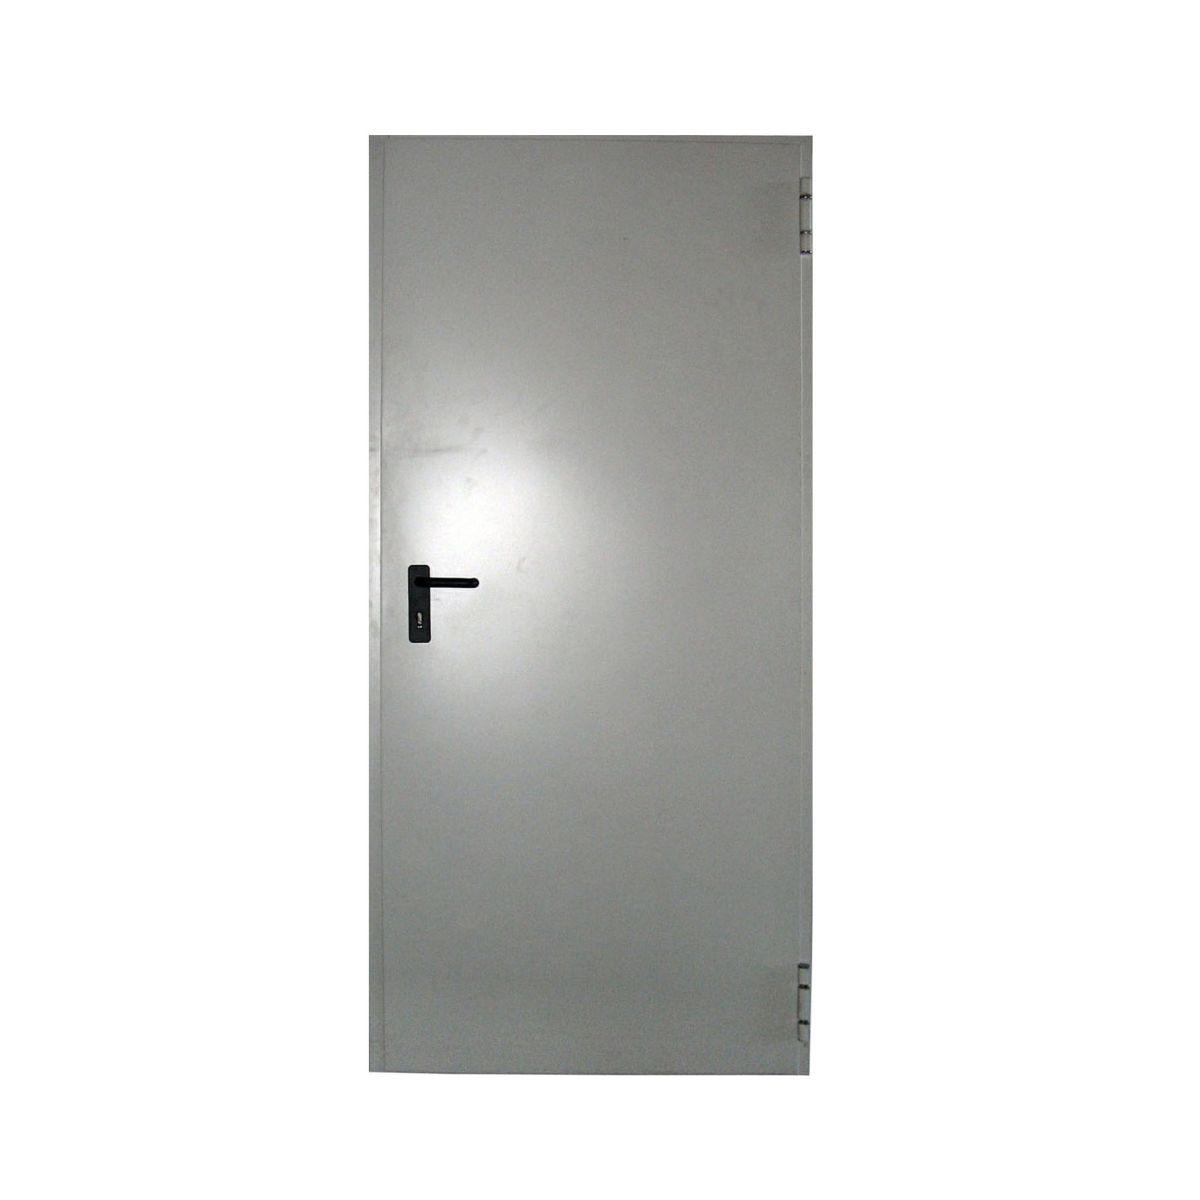 Porta a soffietto leroy merlin milano assago with porta a for Porta leroy merlin